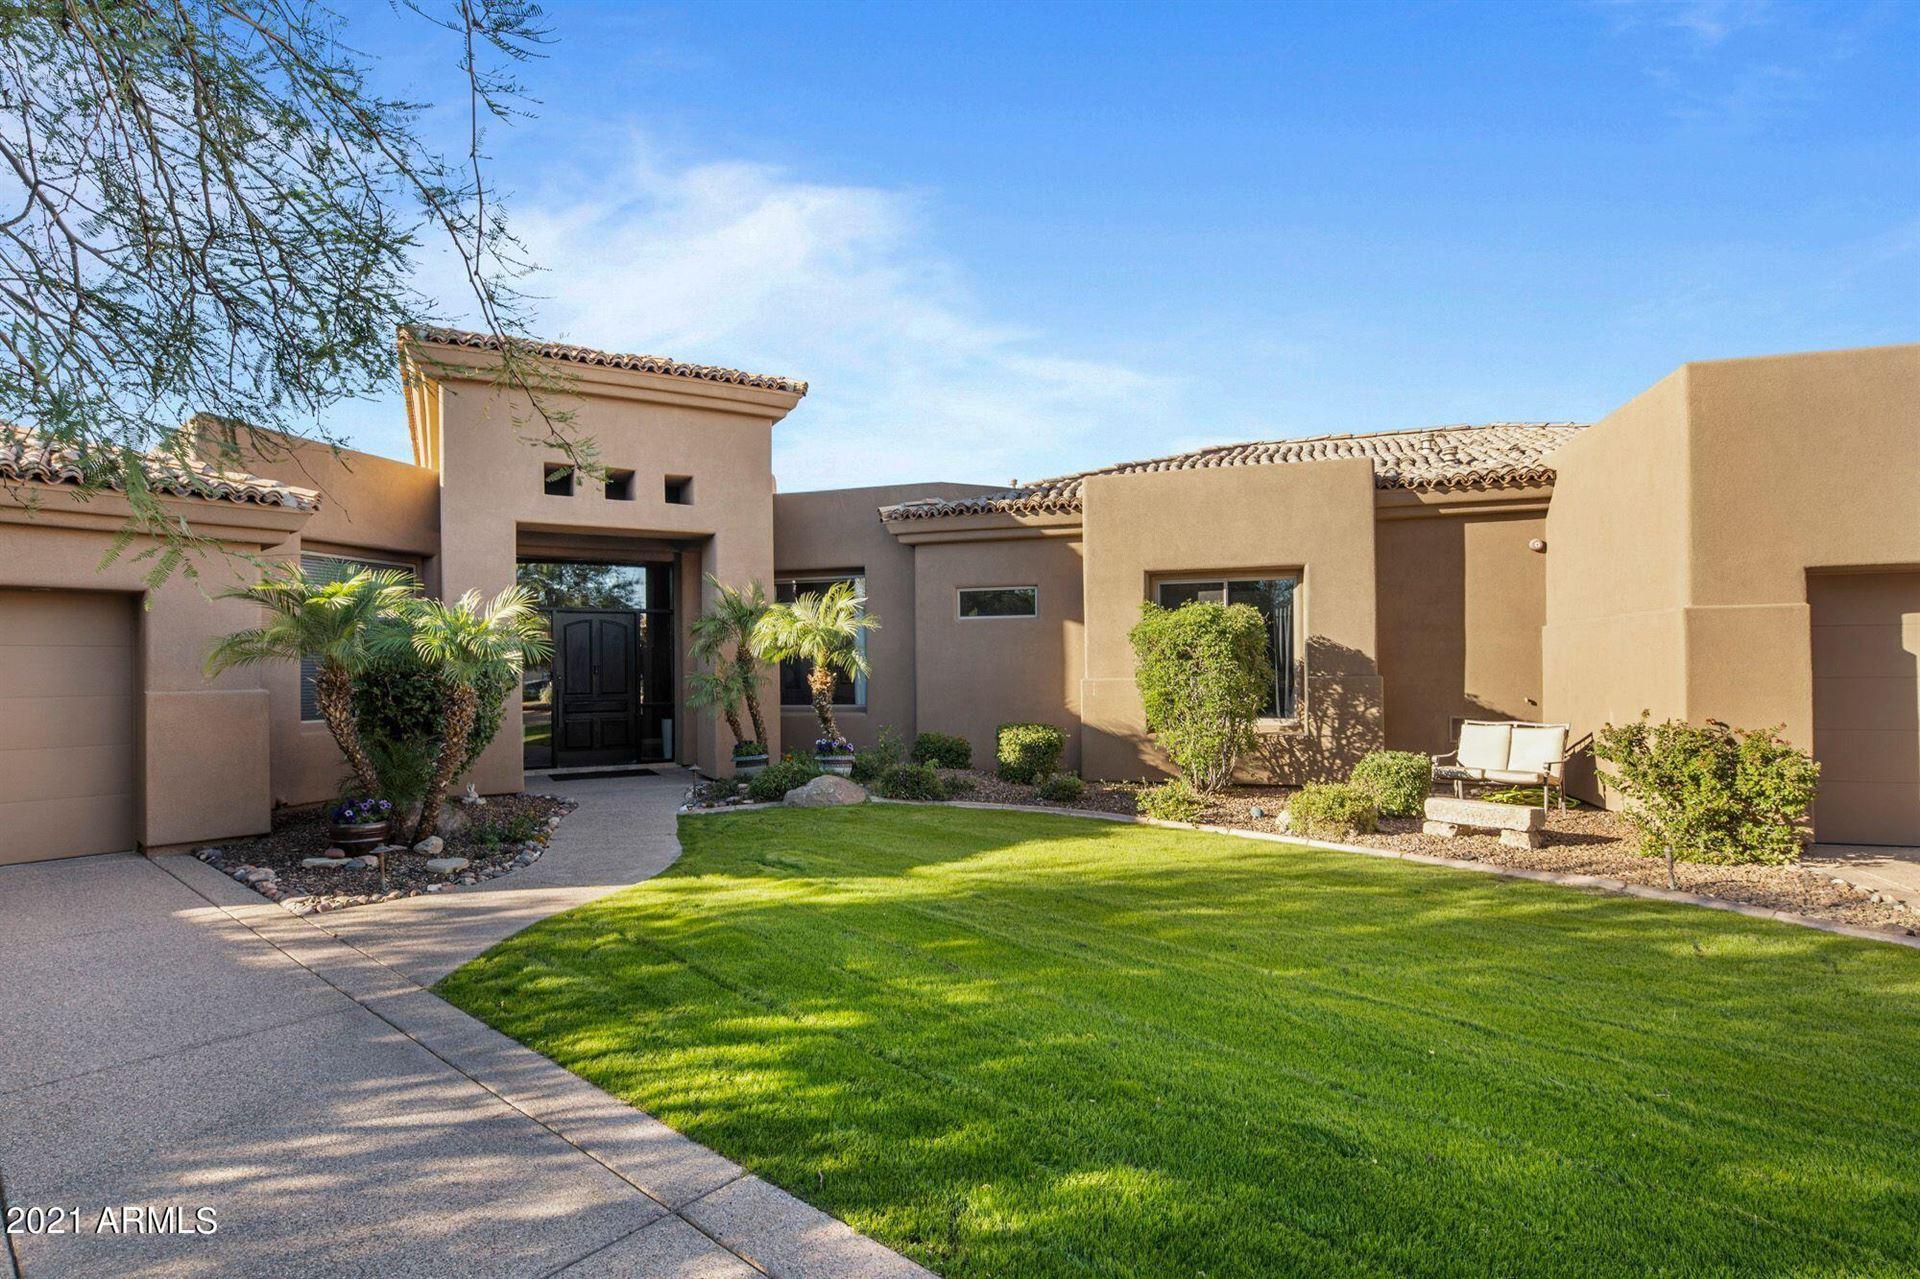 12020 E YUCCA Street, Scottsdale, AZ 85259 - #: 6307003